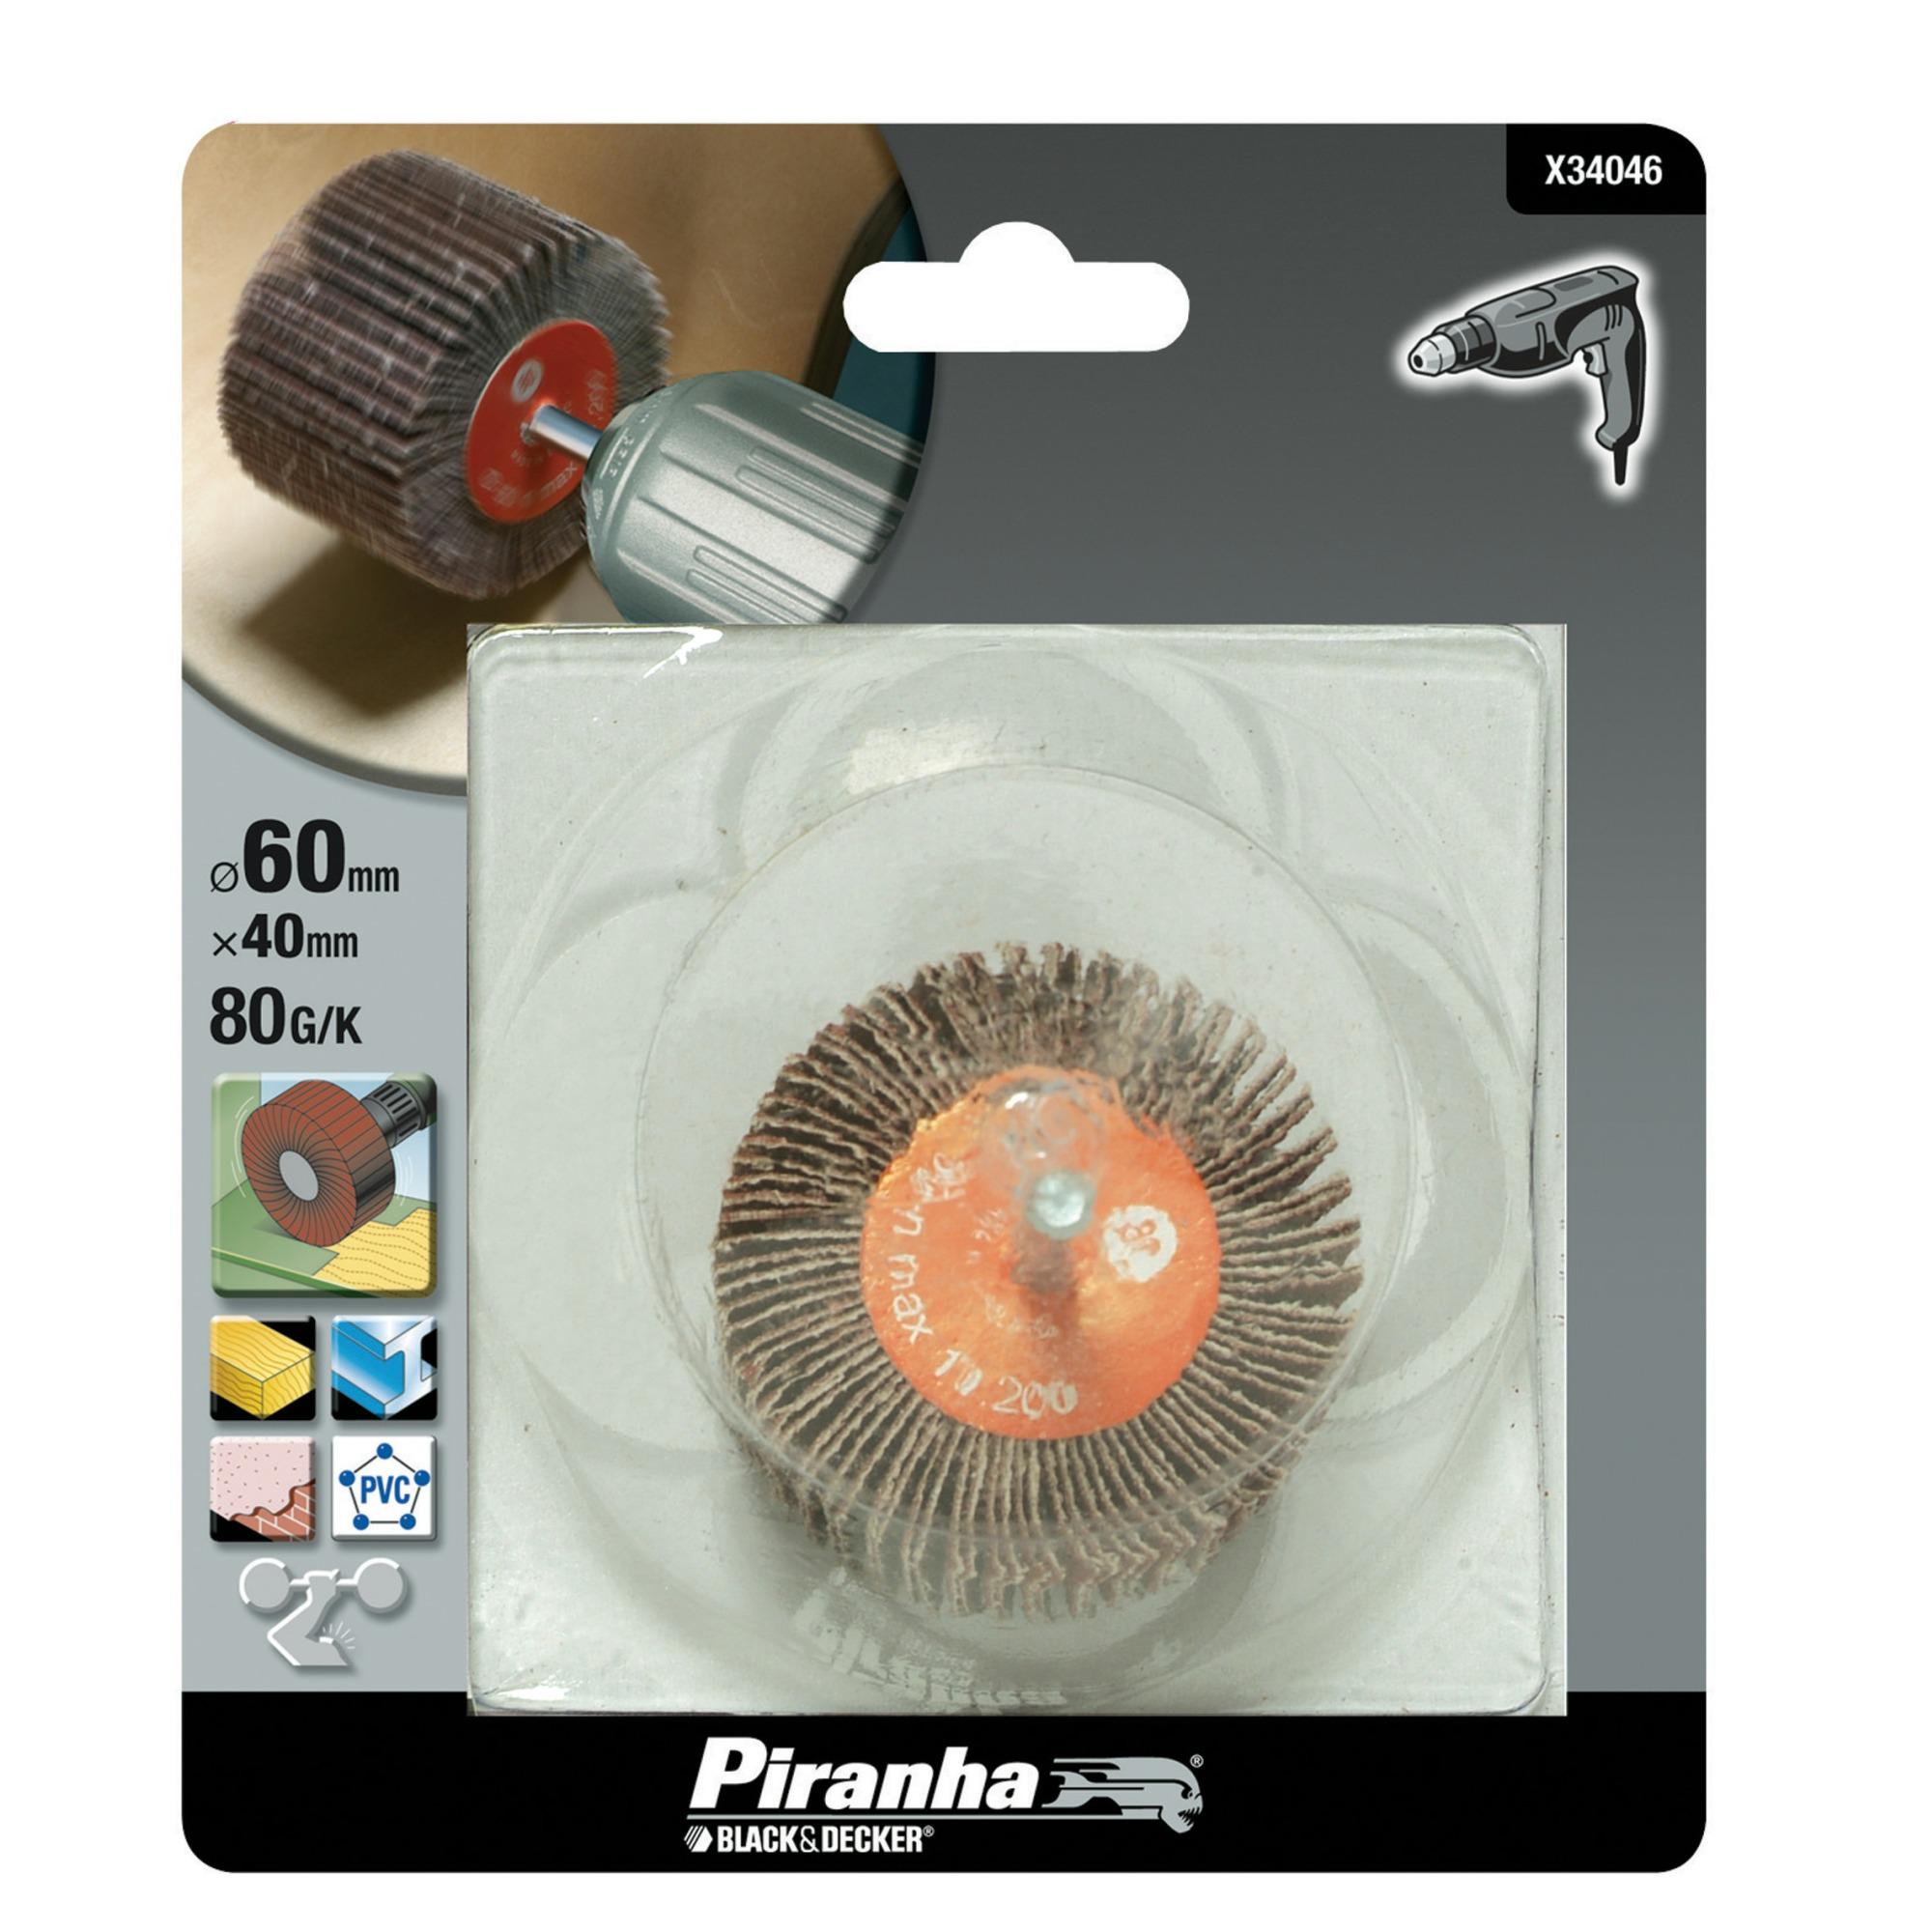 Piranha lamelschuurwiel X34046 K80 40 mm